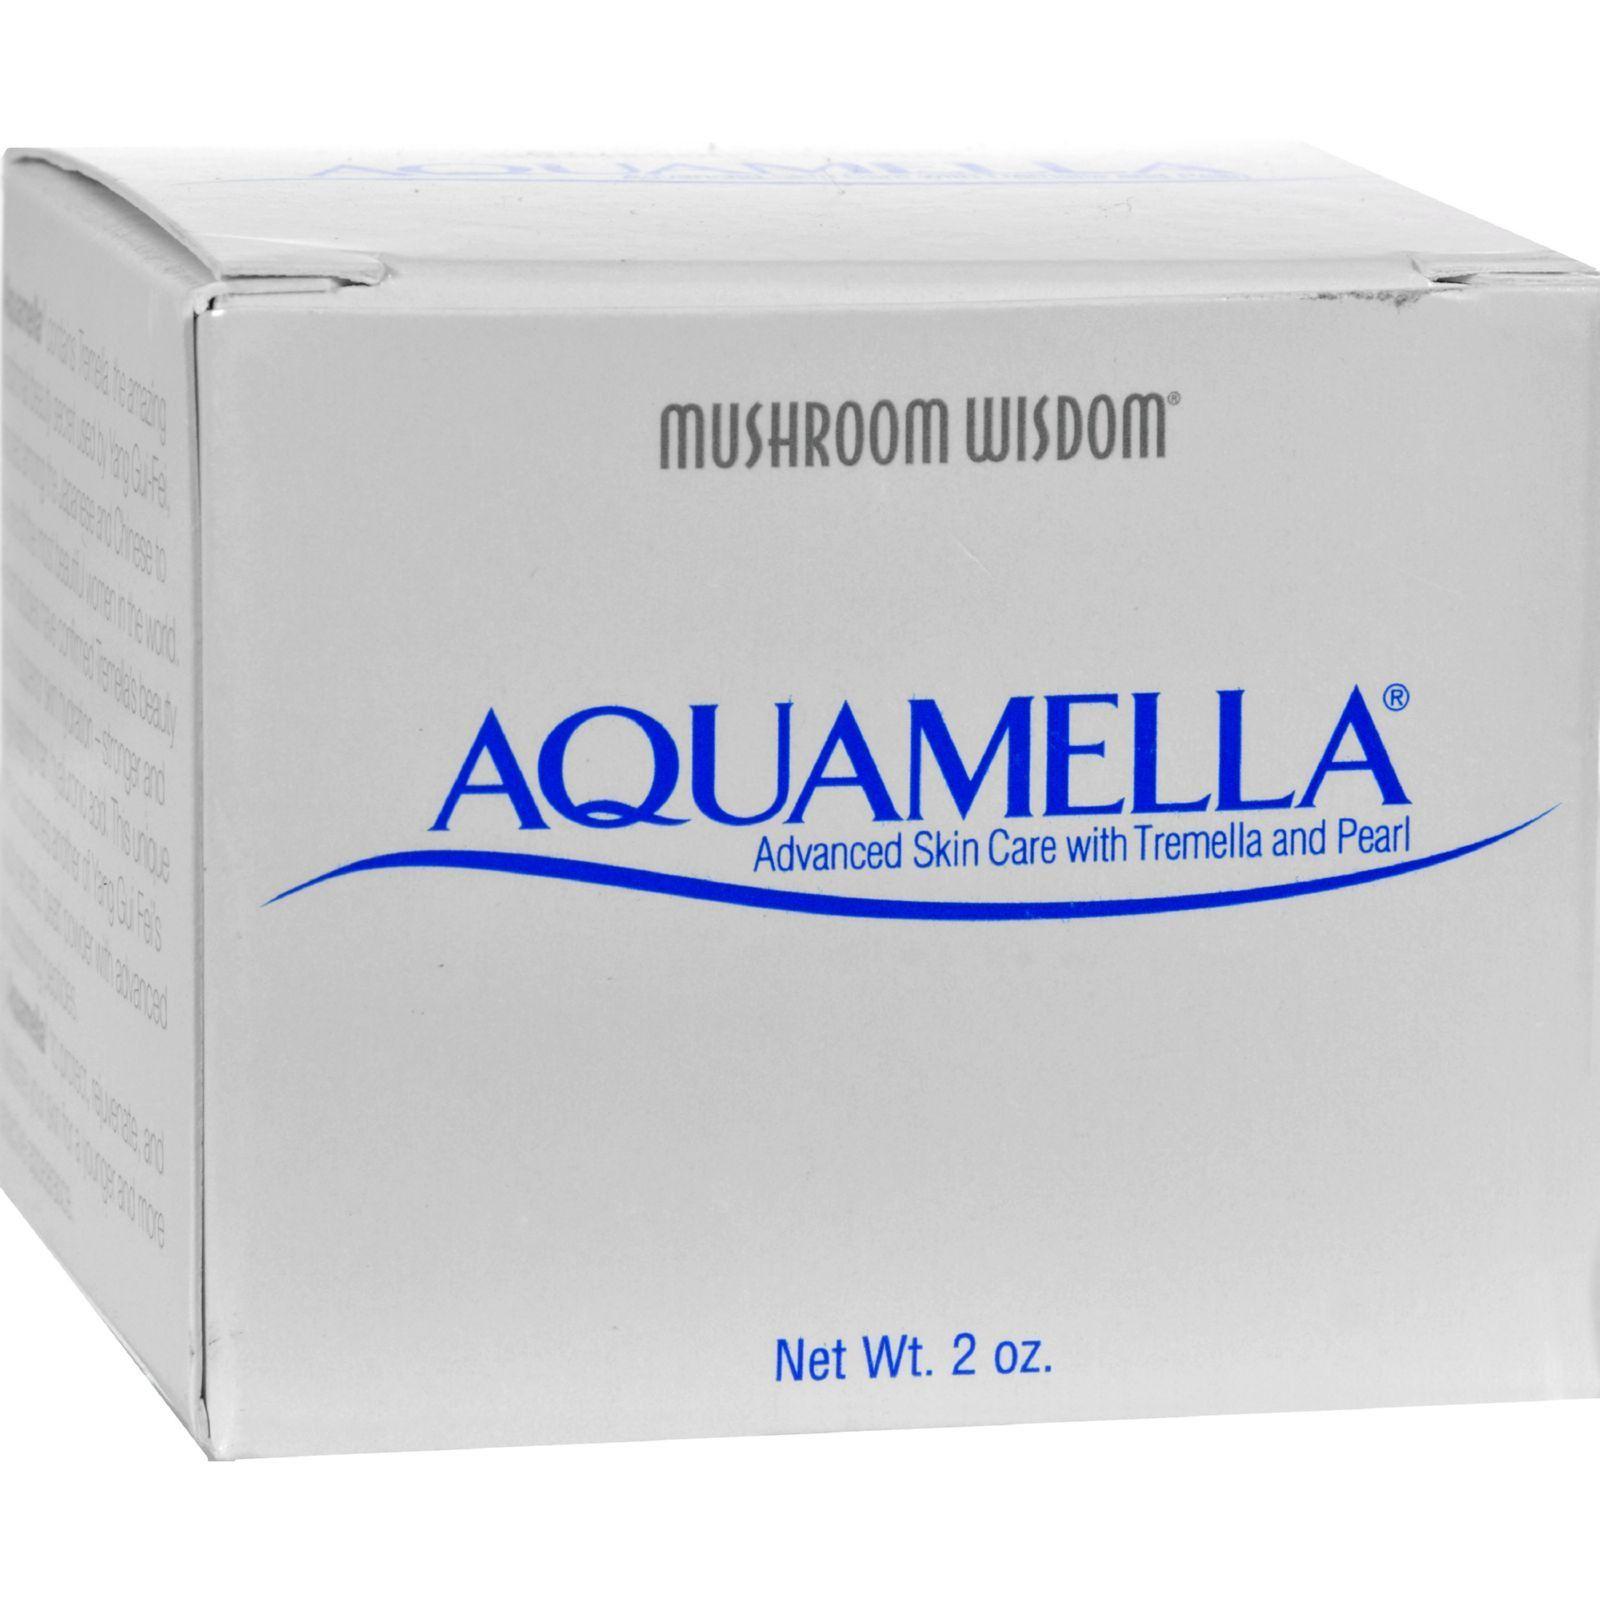 Mushroom Wisdom Aquamella - 2 Oz Dermelect Detoxifying Oxygen (o2) Facial Commission  100ml/3.3oz